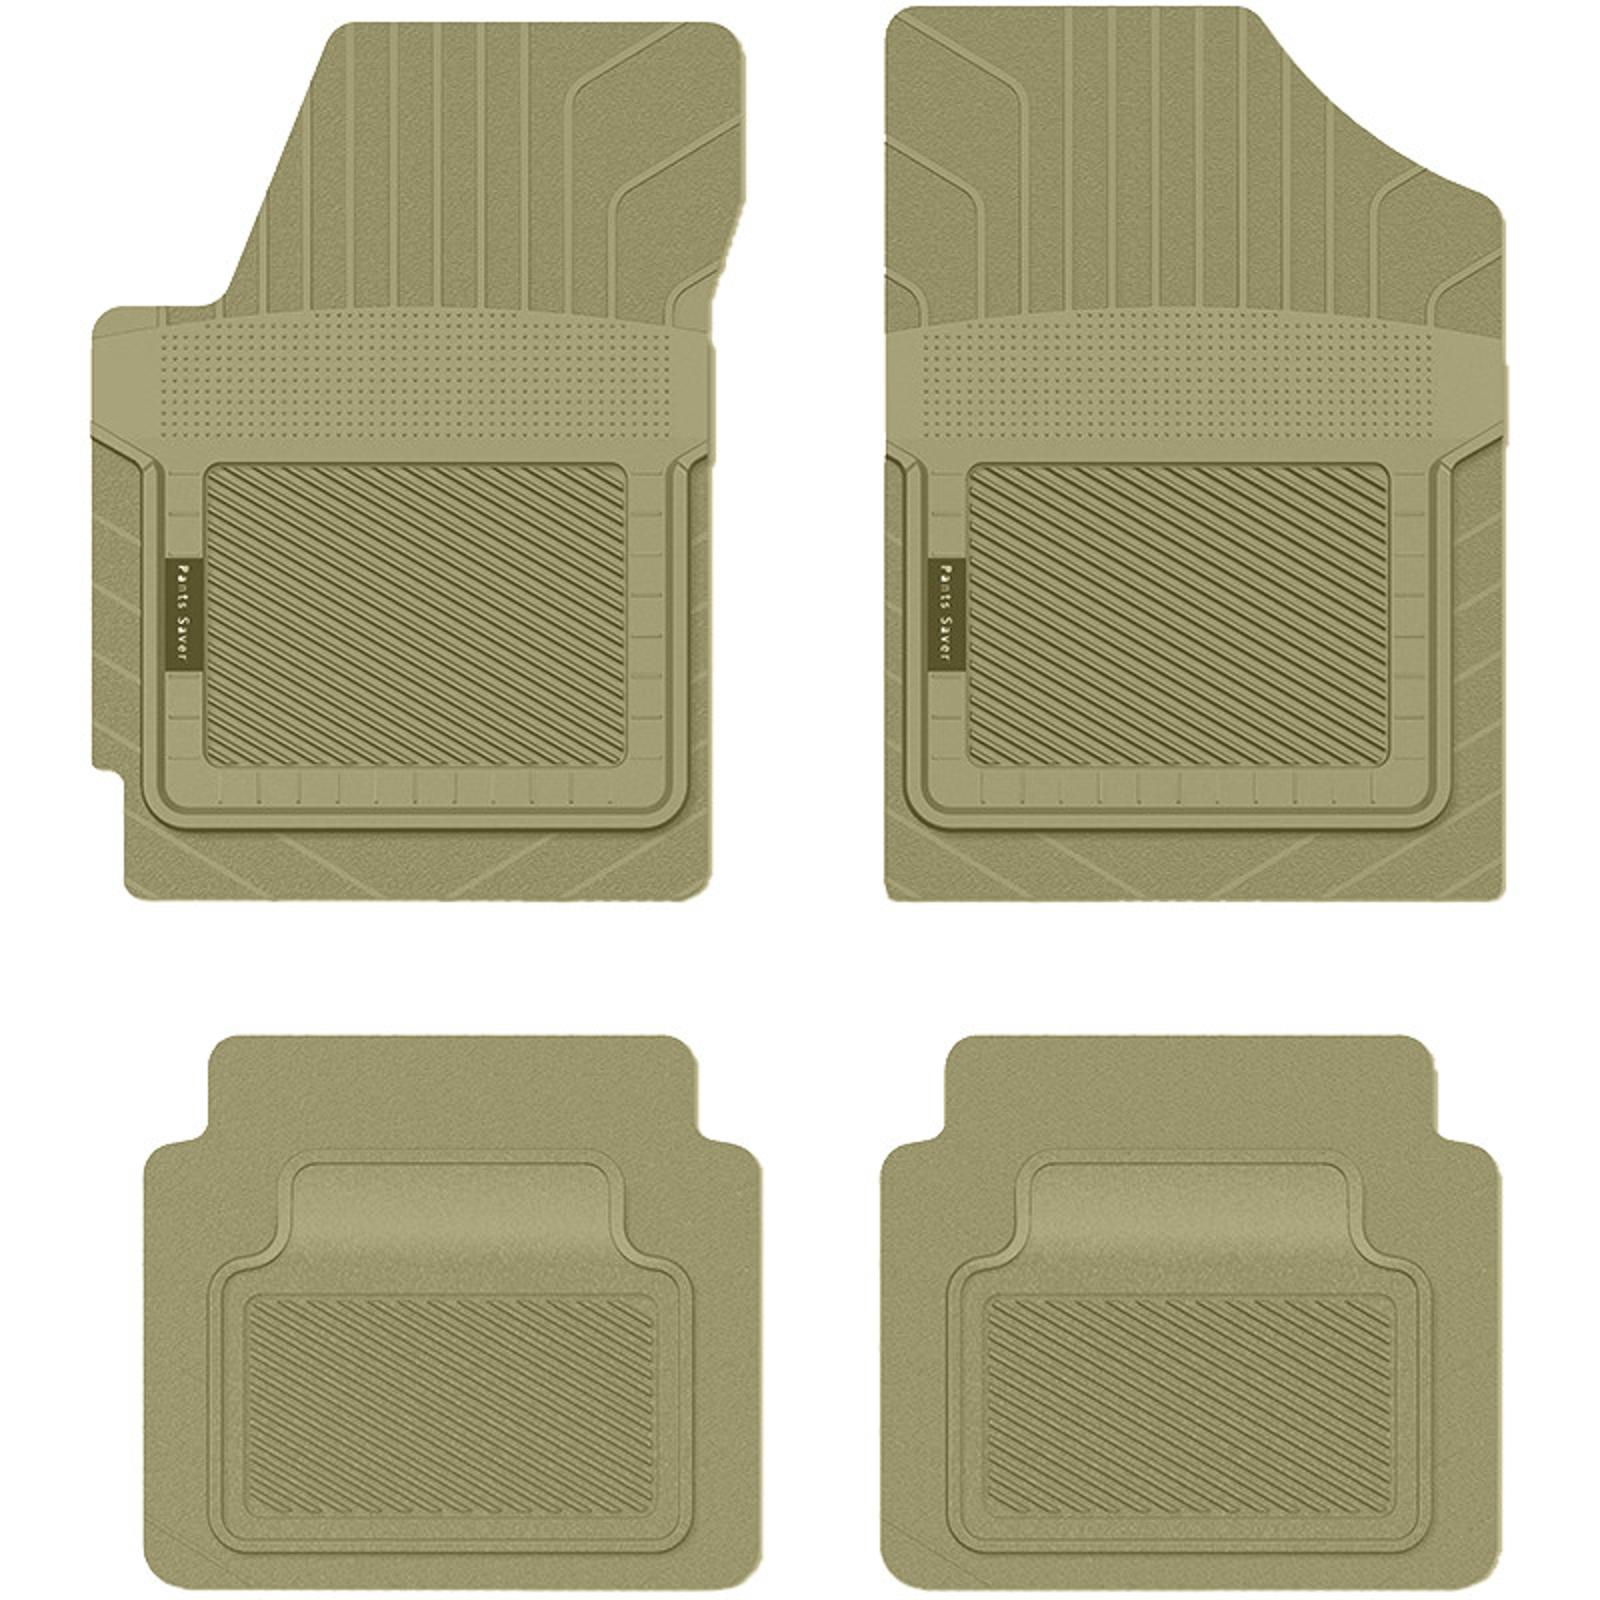 Koolatron Pants Saver Custom Fit Car Mat 4PC CHEVROLET EXPRESS G1500 2013 Tan PartNumber: 02845062000P KsnValue: 082V009223107000 MfgPartNumber: 0715133